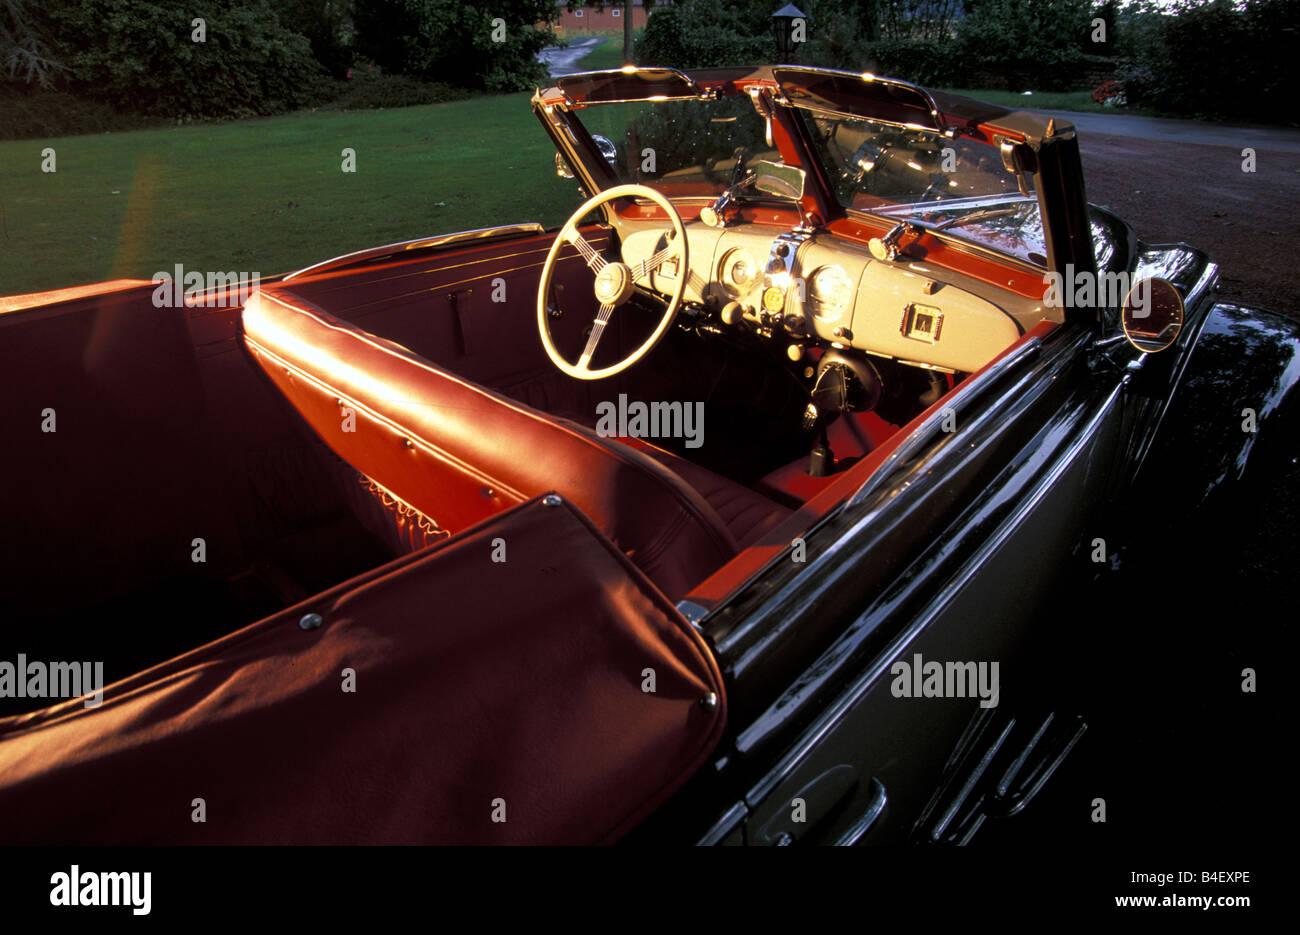 Car, OM Mille Miglia No. 1, Oldsmobile, vintage car,  convertible, convertible top, open, interior, Cockpit, technics, - Stock Image